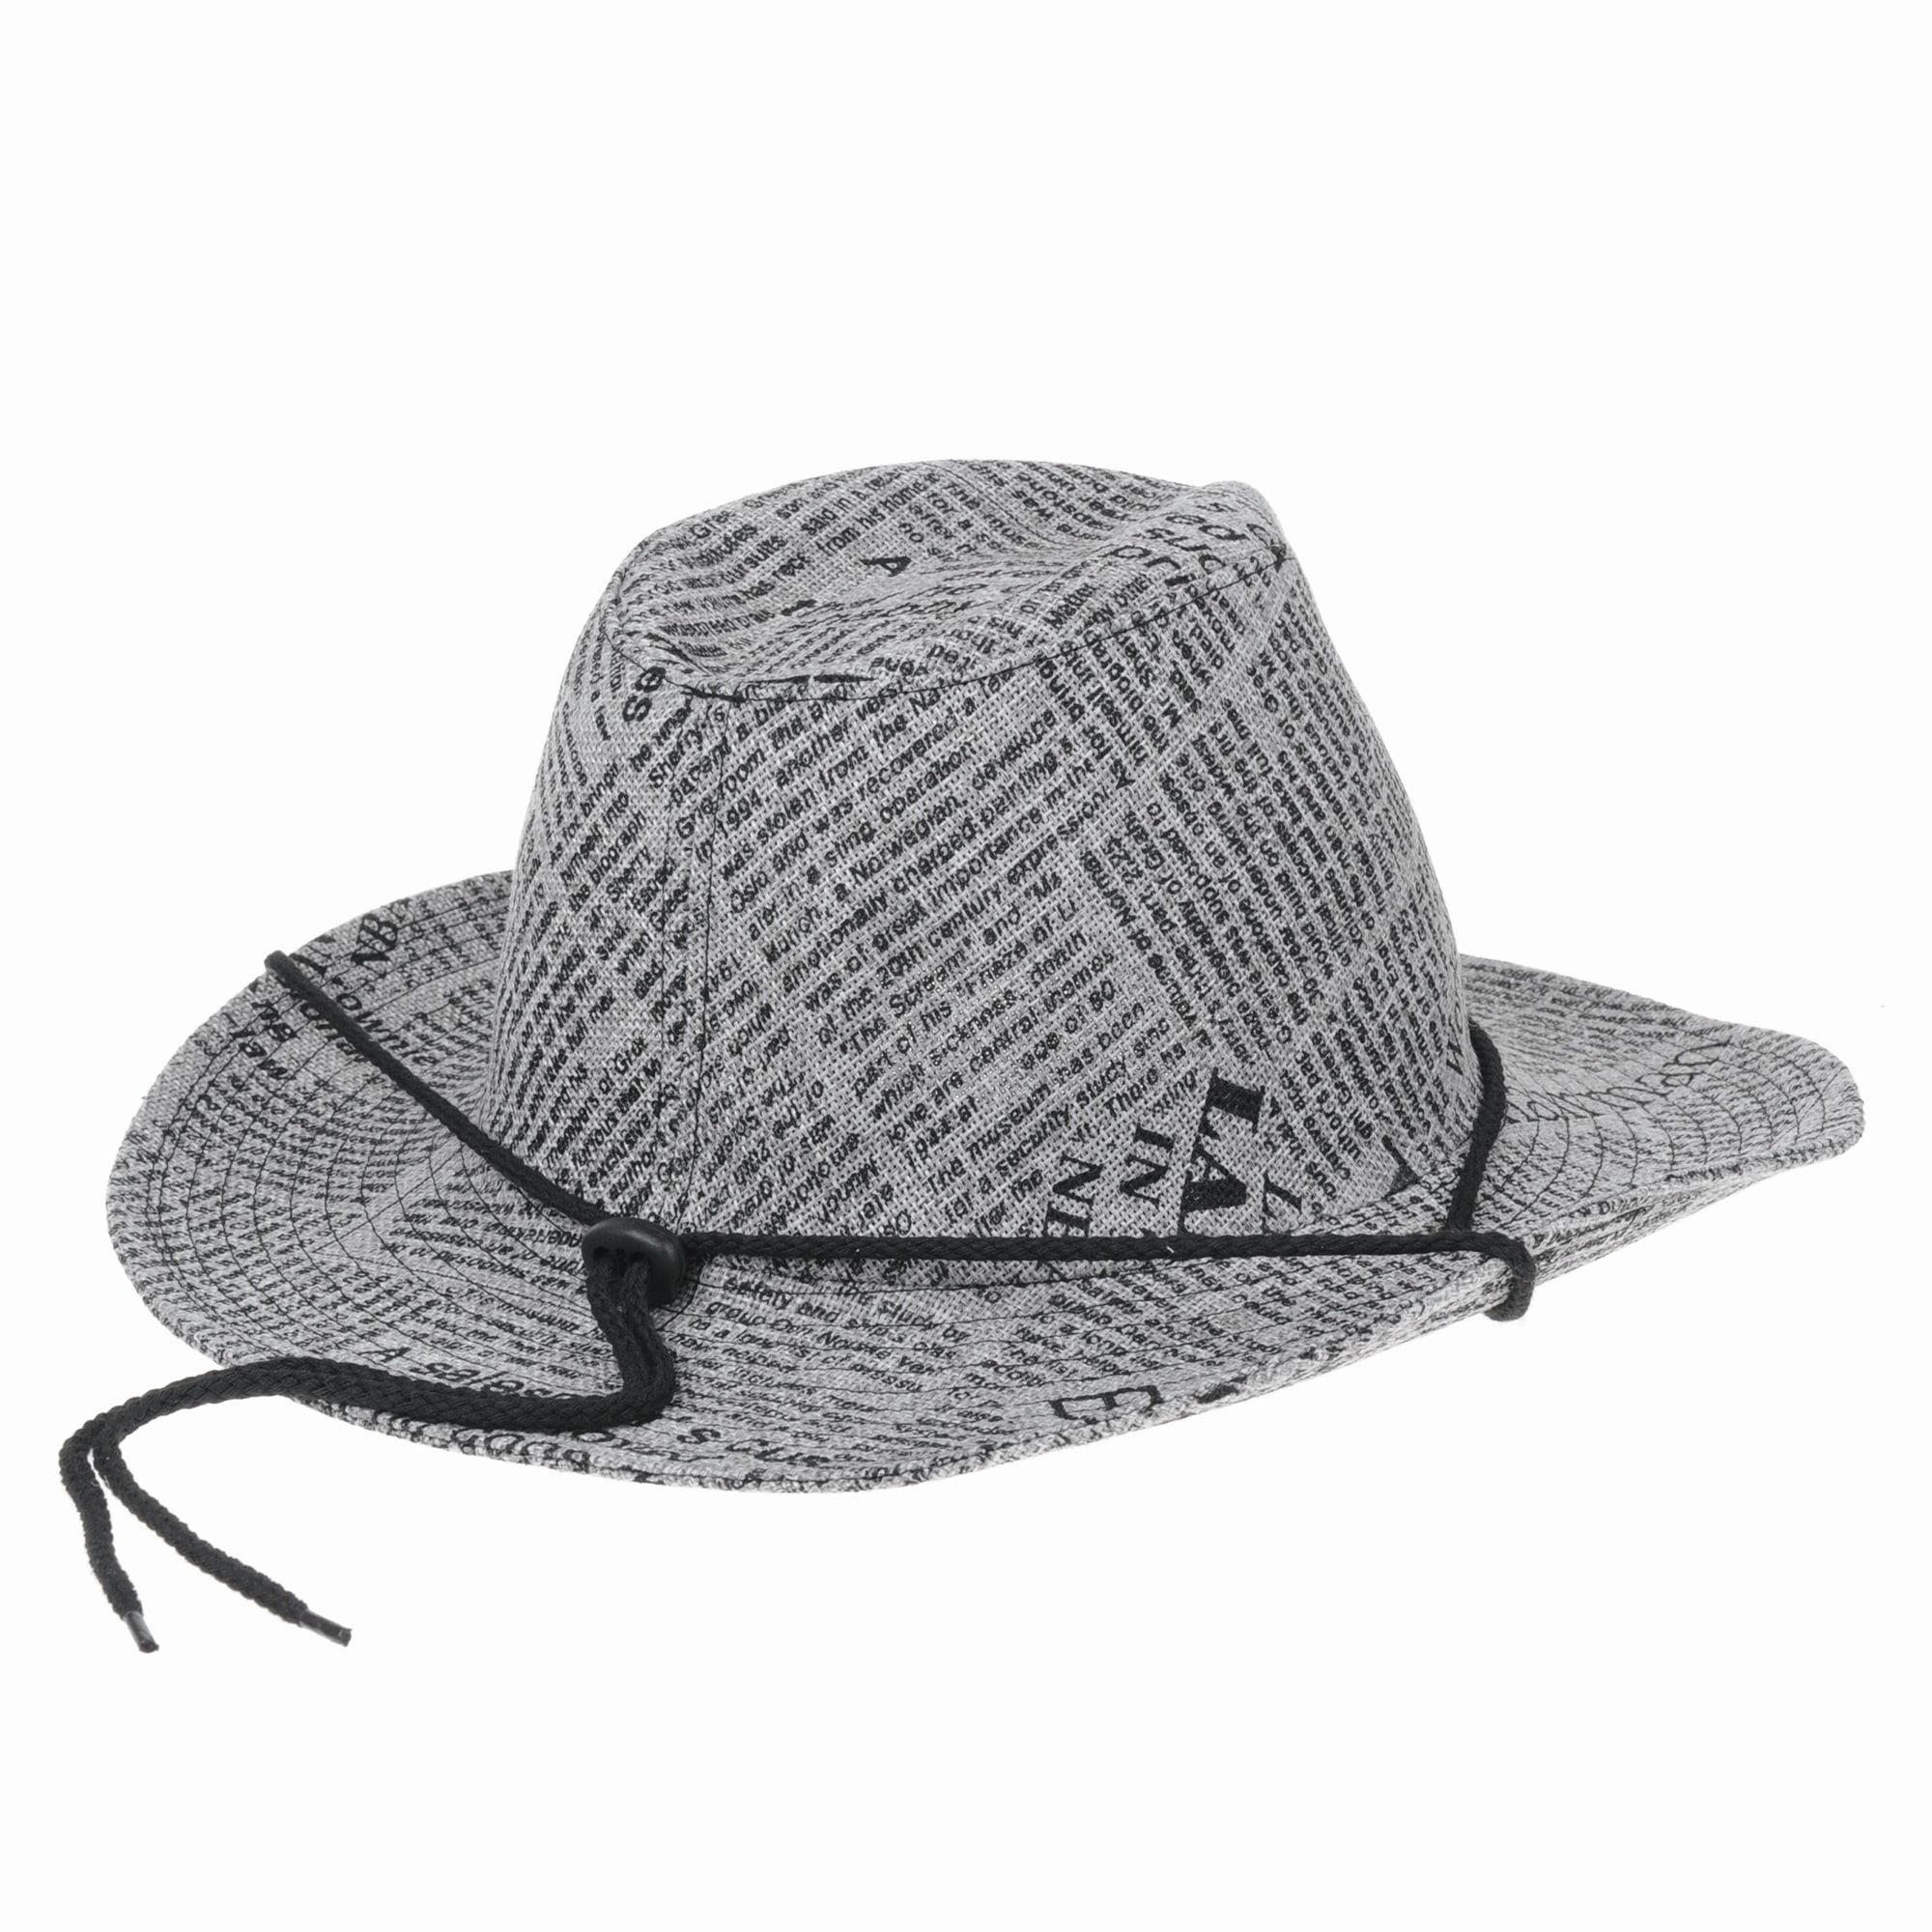 WITHMOONS Western Cowboy Hat Paper Straw Linen Fedora DW8311 (Grey) -  Walmart.com d949d92c679